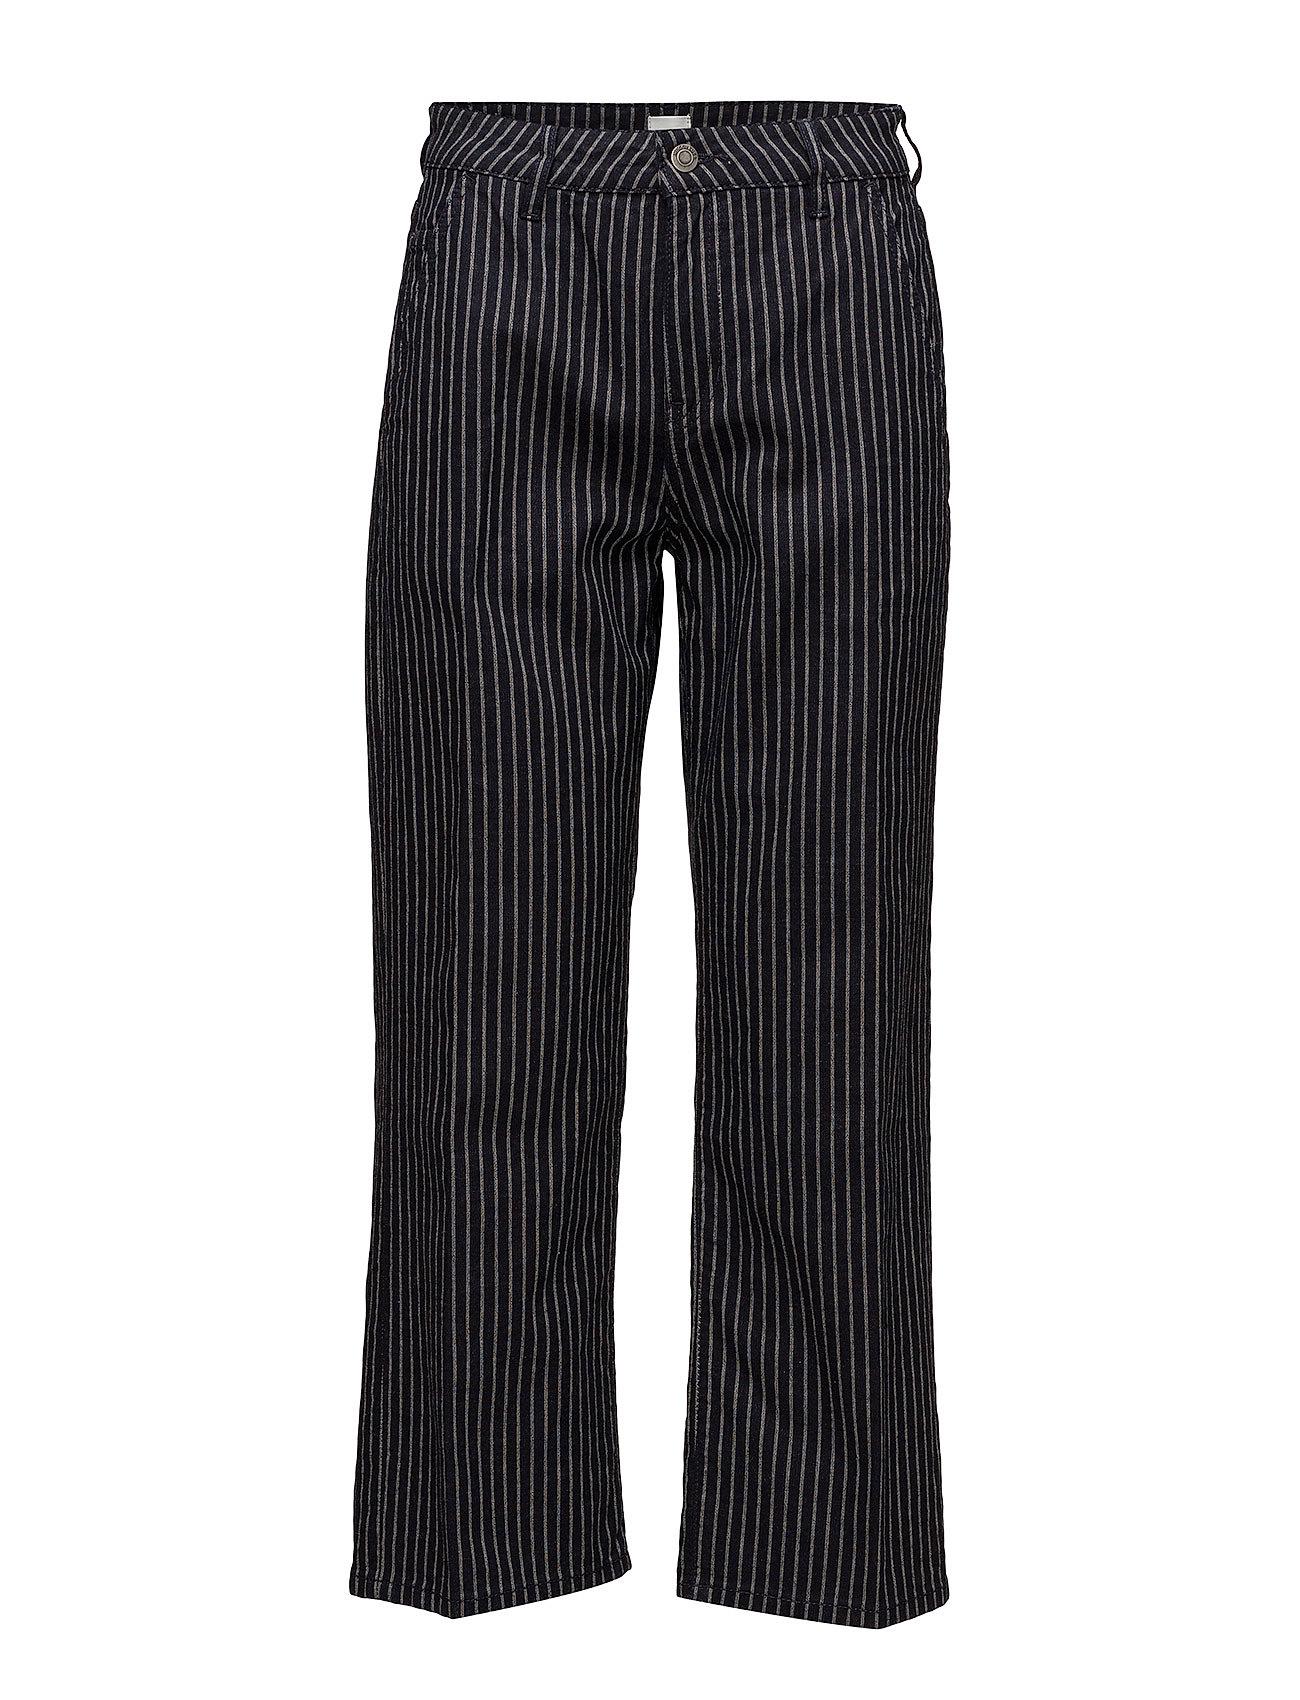 Jeans Sale - J91 Joliet